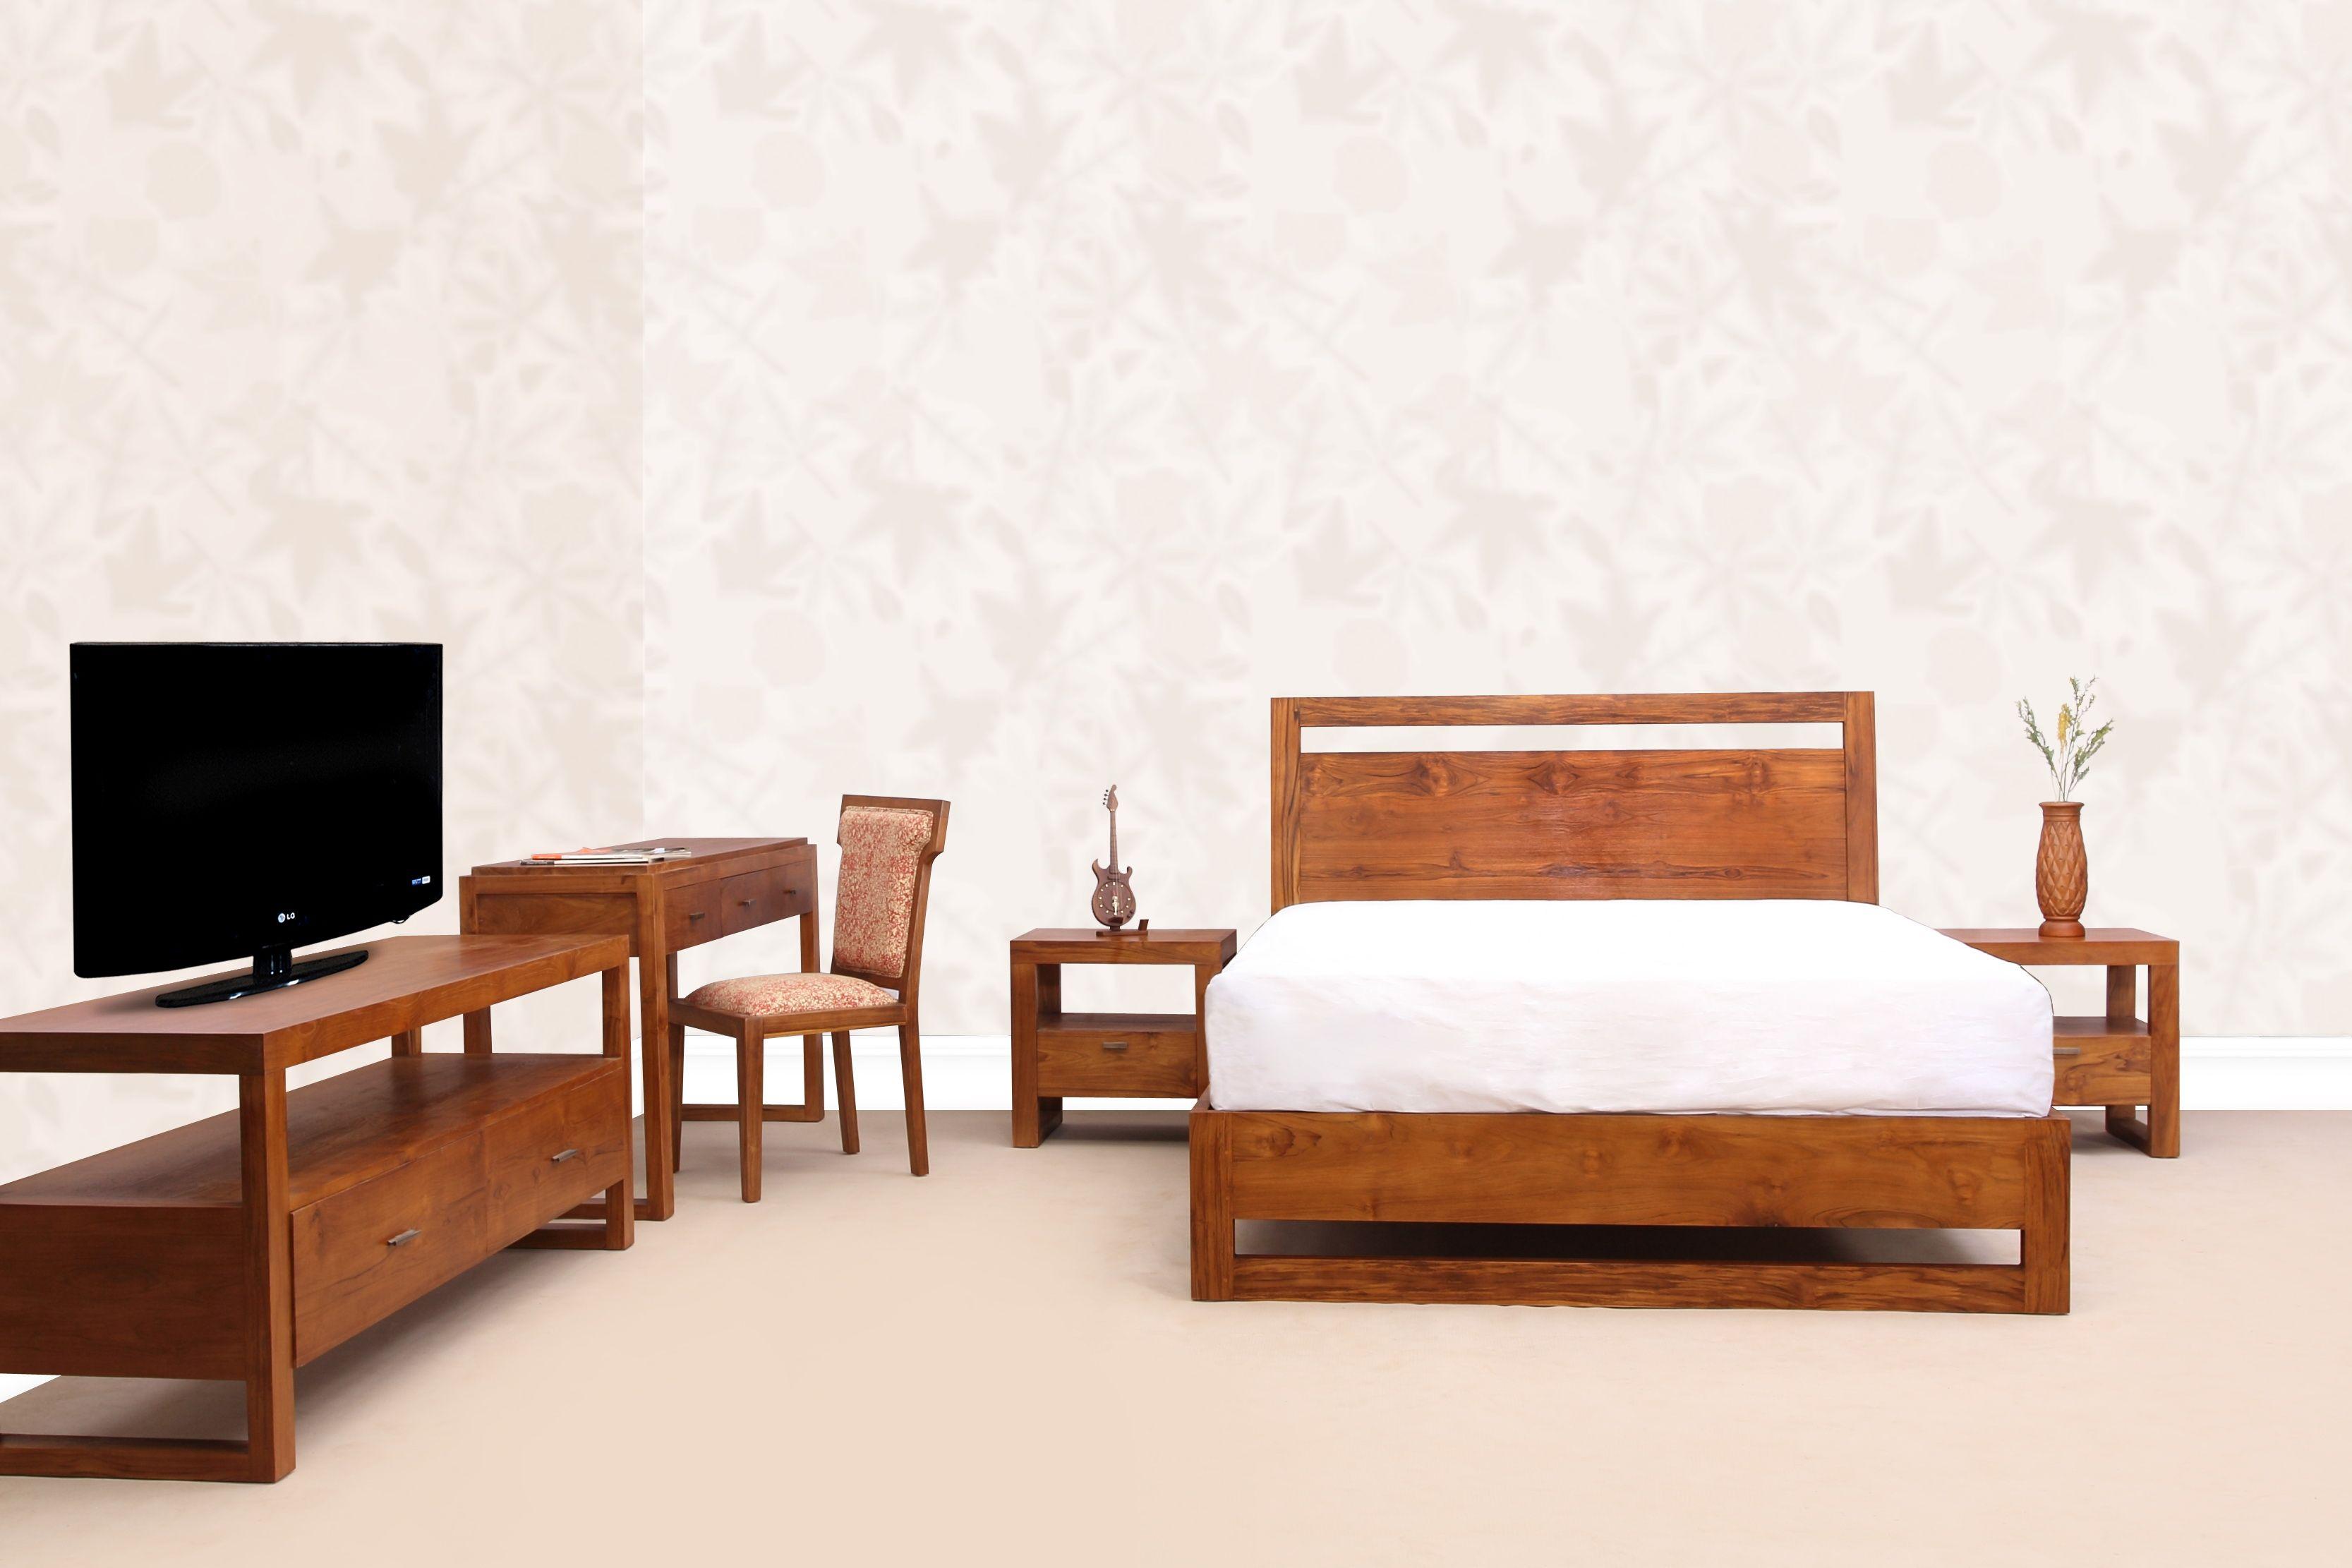 Solid teak wood bedroom set made of Indonesian plantation teak wood ...